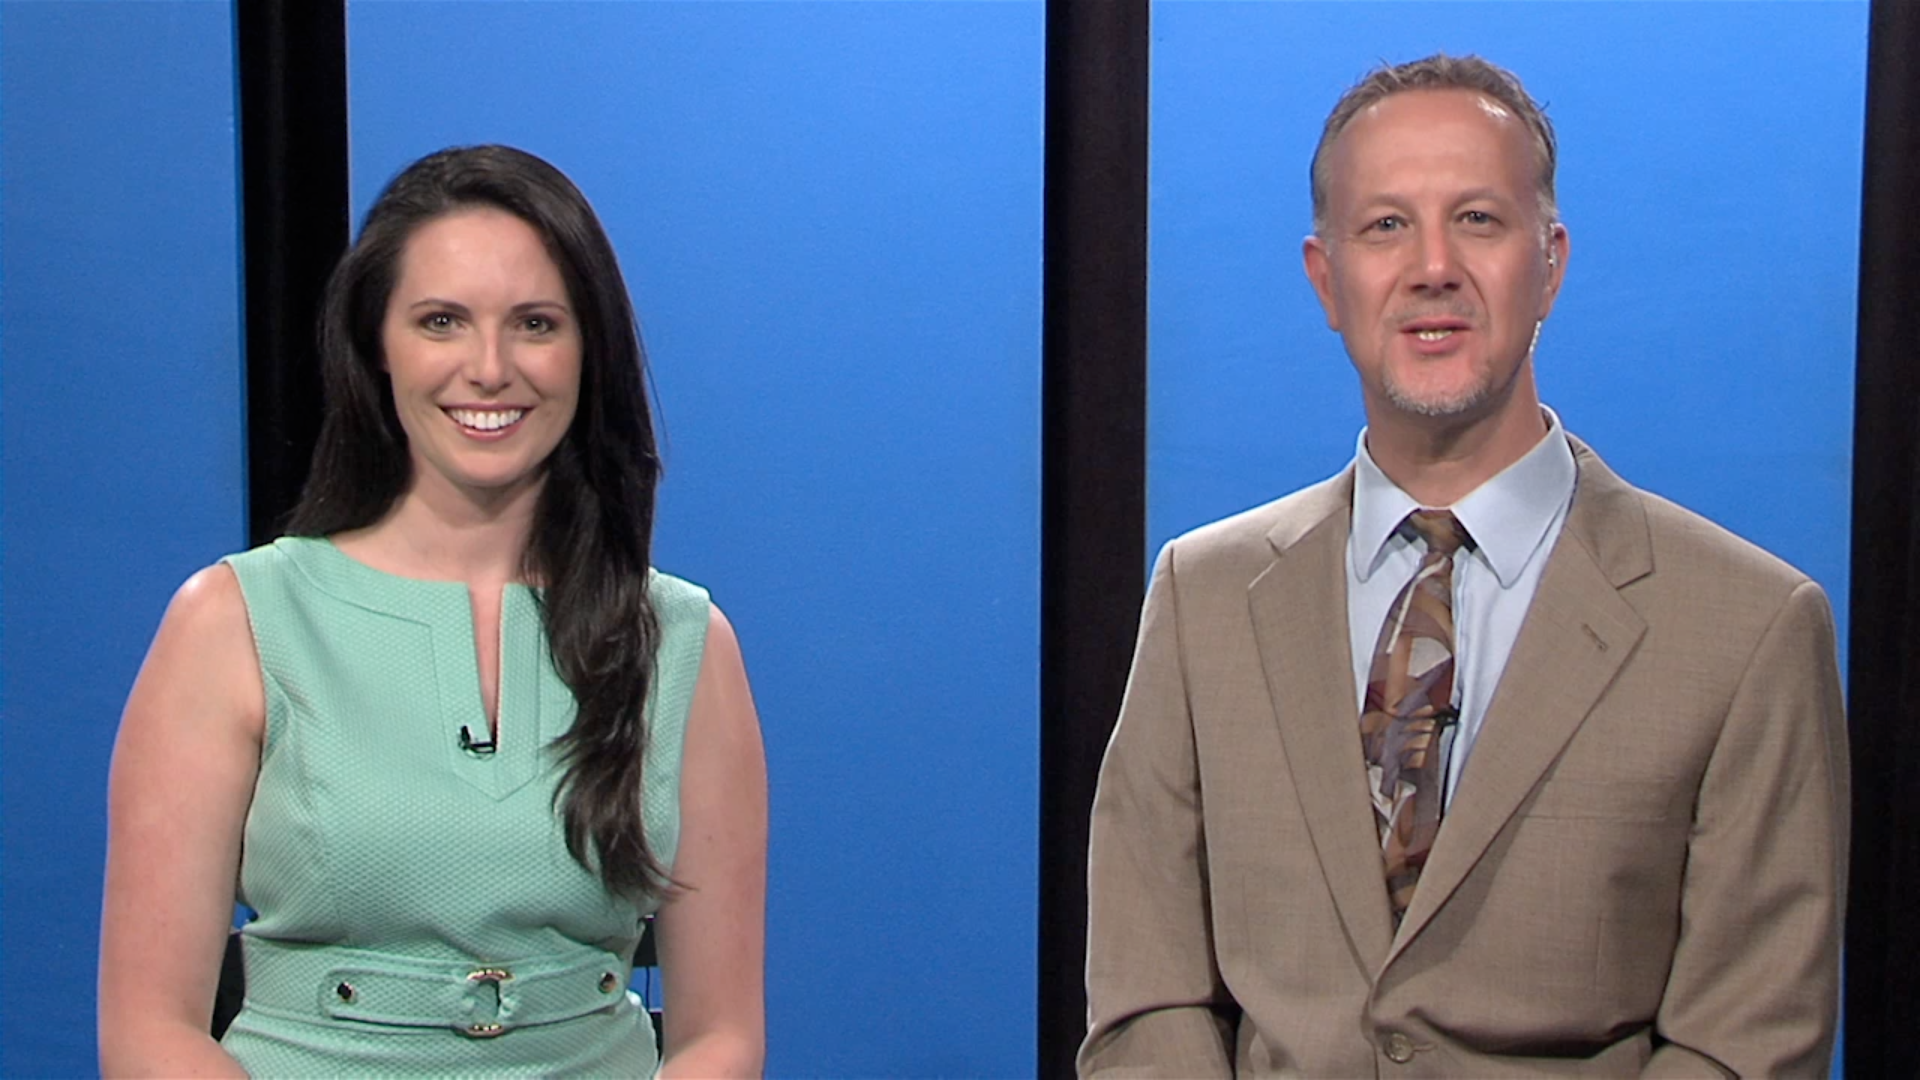 Newscast: June 5, 2013